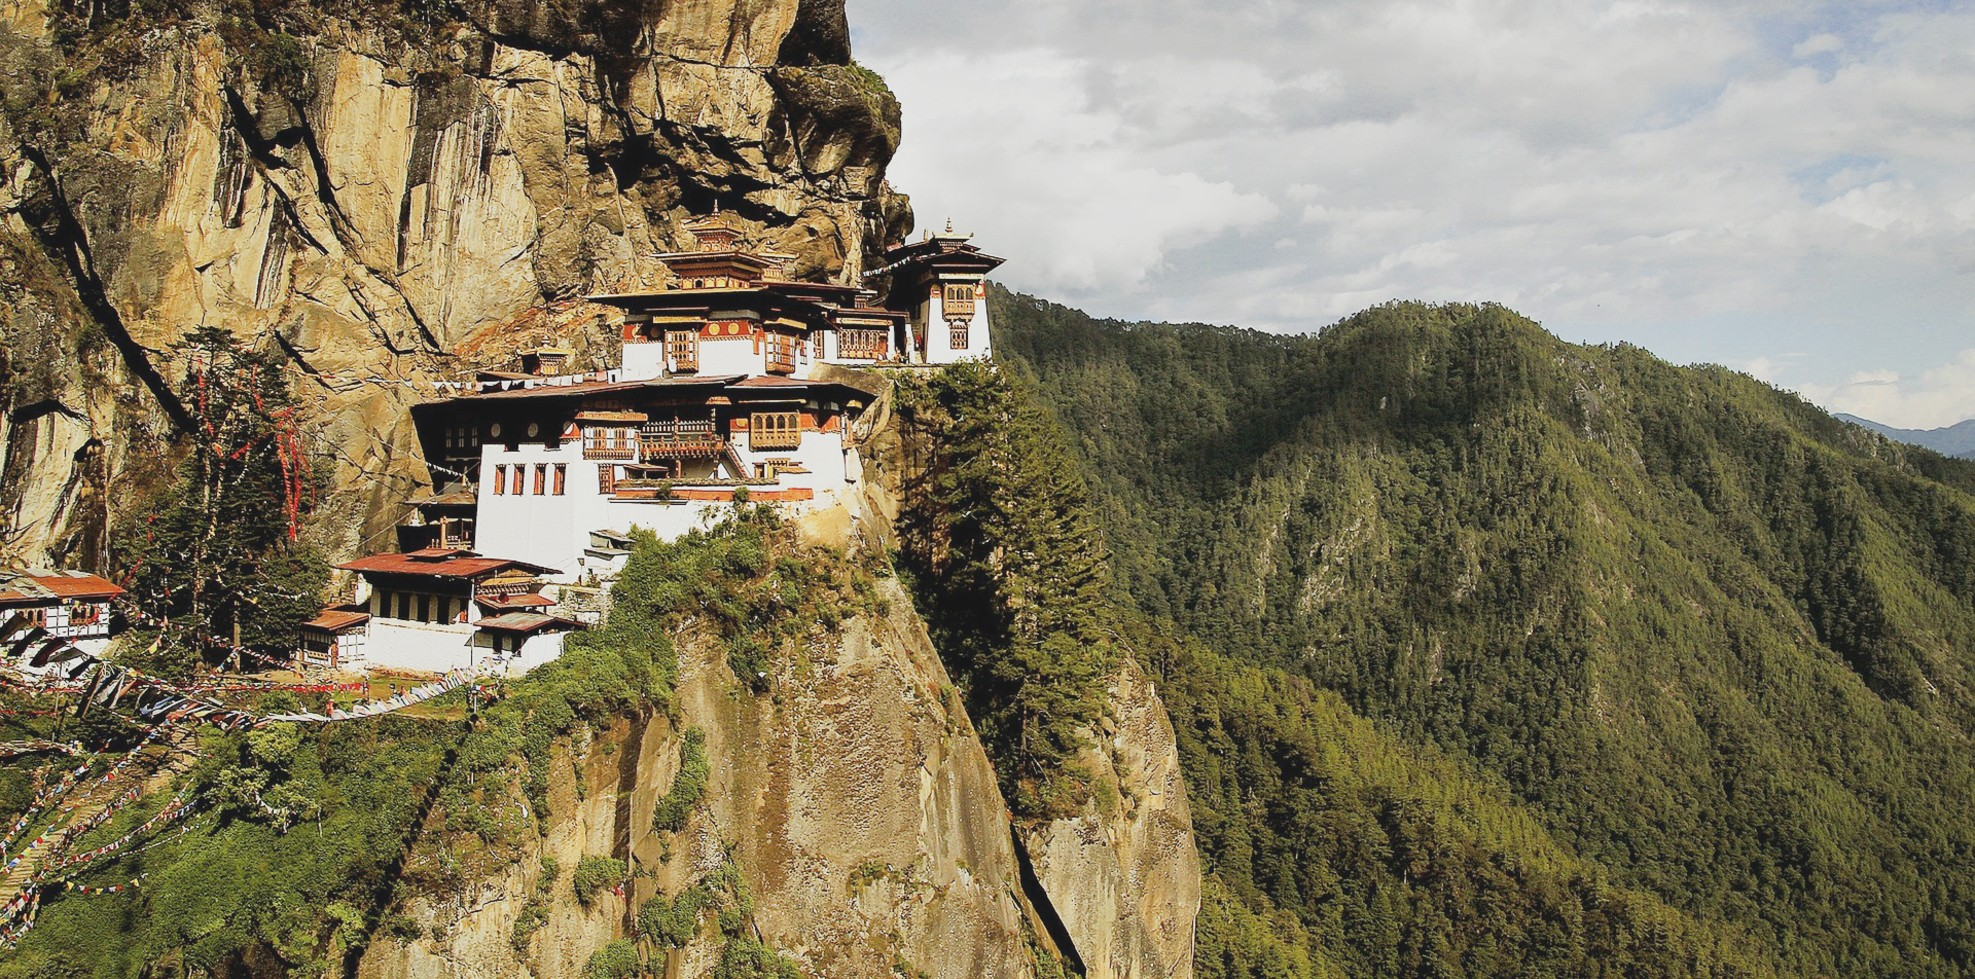 Everest Base Camp Trek with Bhutan Short Tour -17 Day